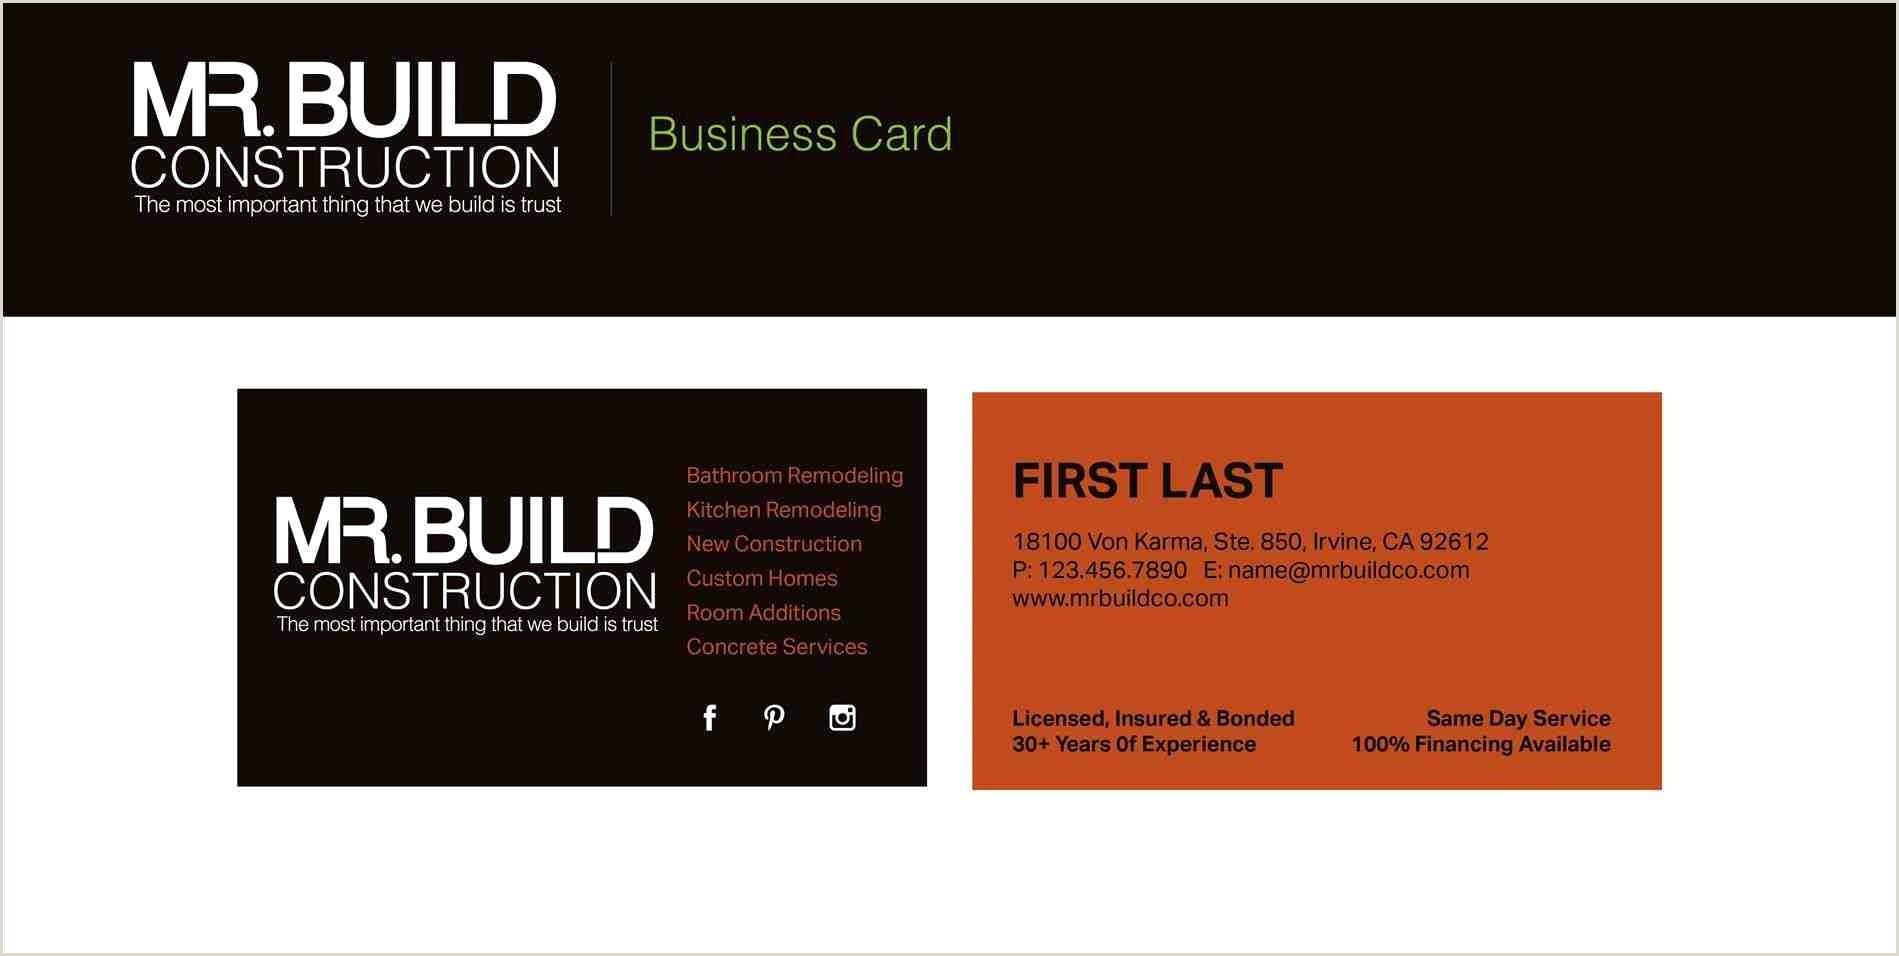 Business Card With Logo Template 14 Popular Hardwood Flooring Business Card Template